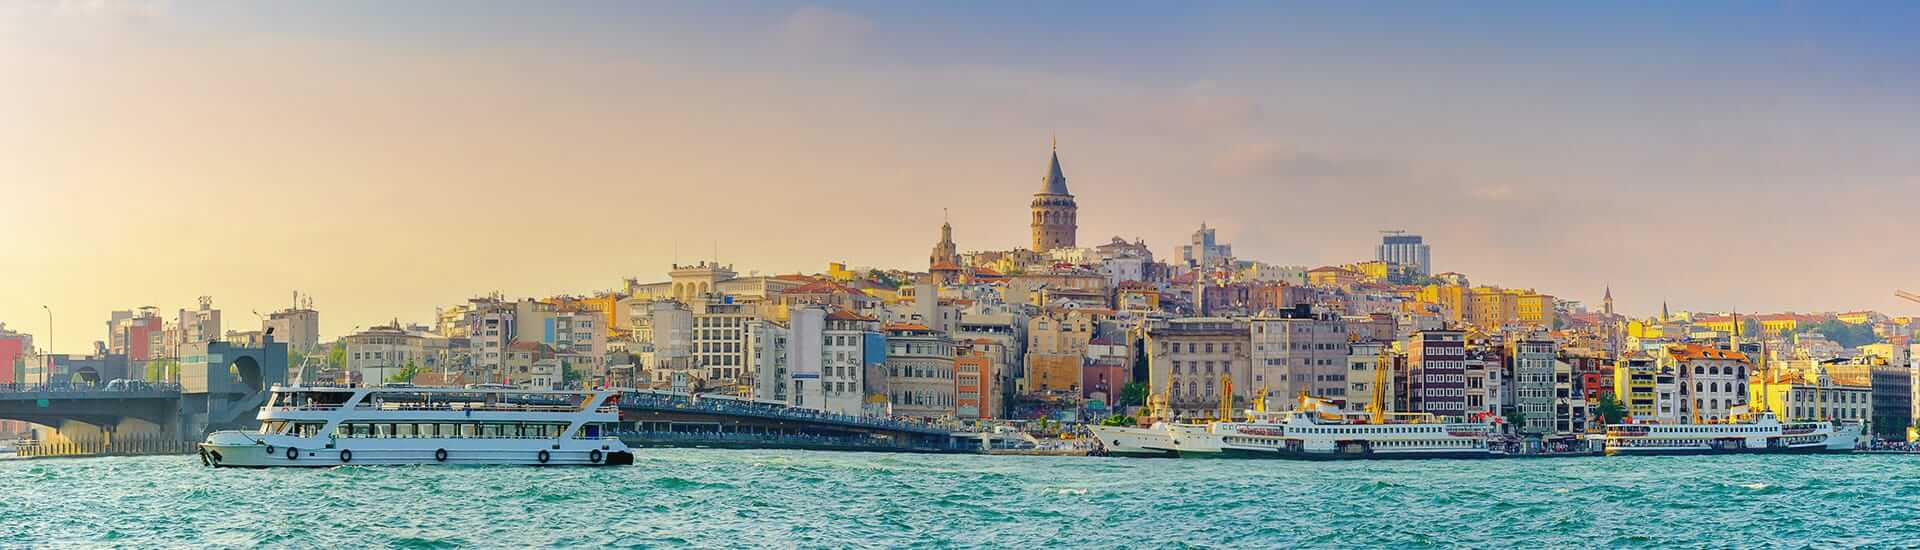 Selimpaşa (İstanbul)